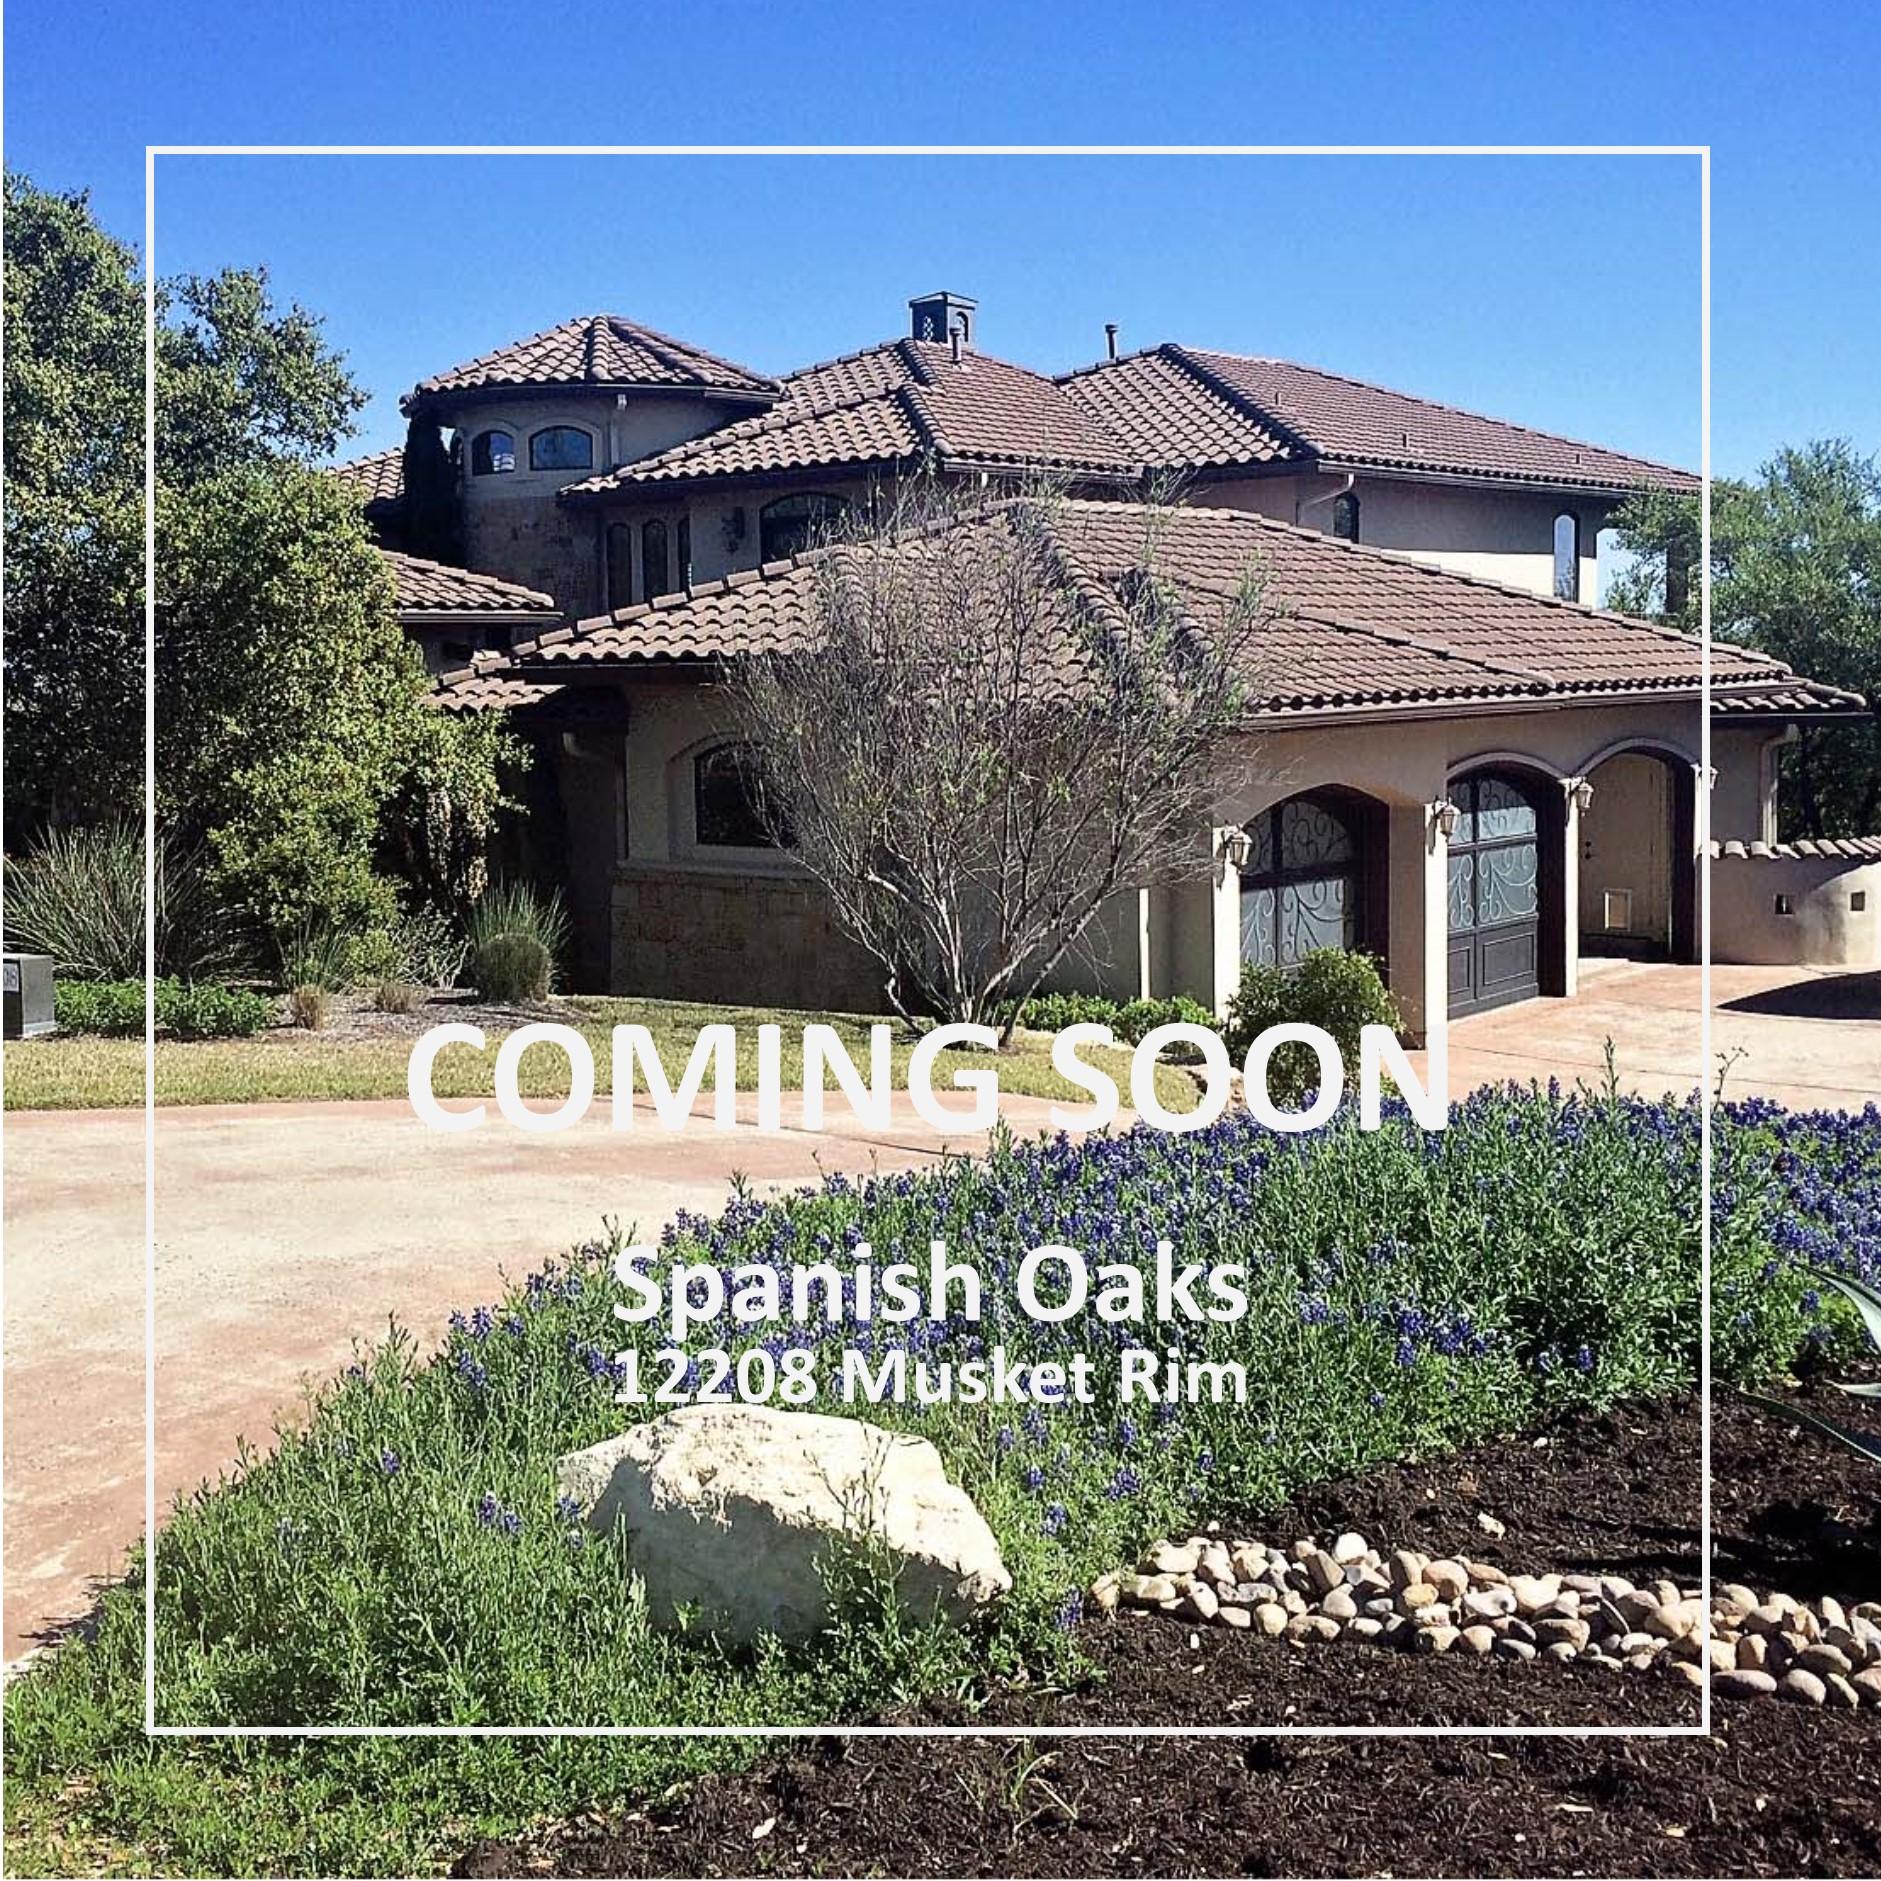 Spanish Oaks Home for Sale | Austin Real Estate Group | Lori Wakefield REALTOR